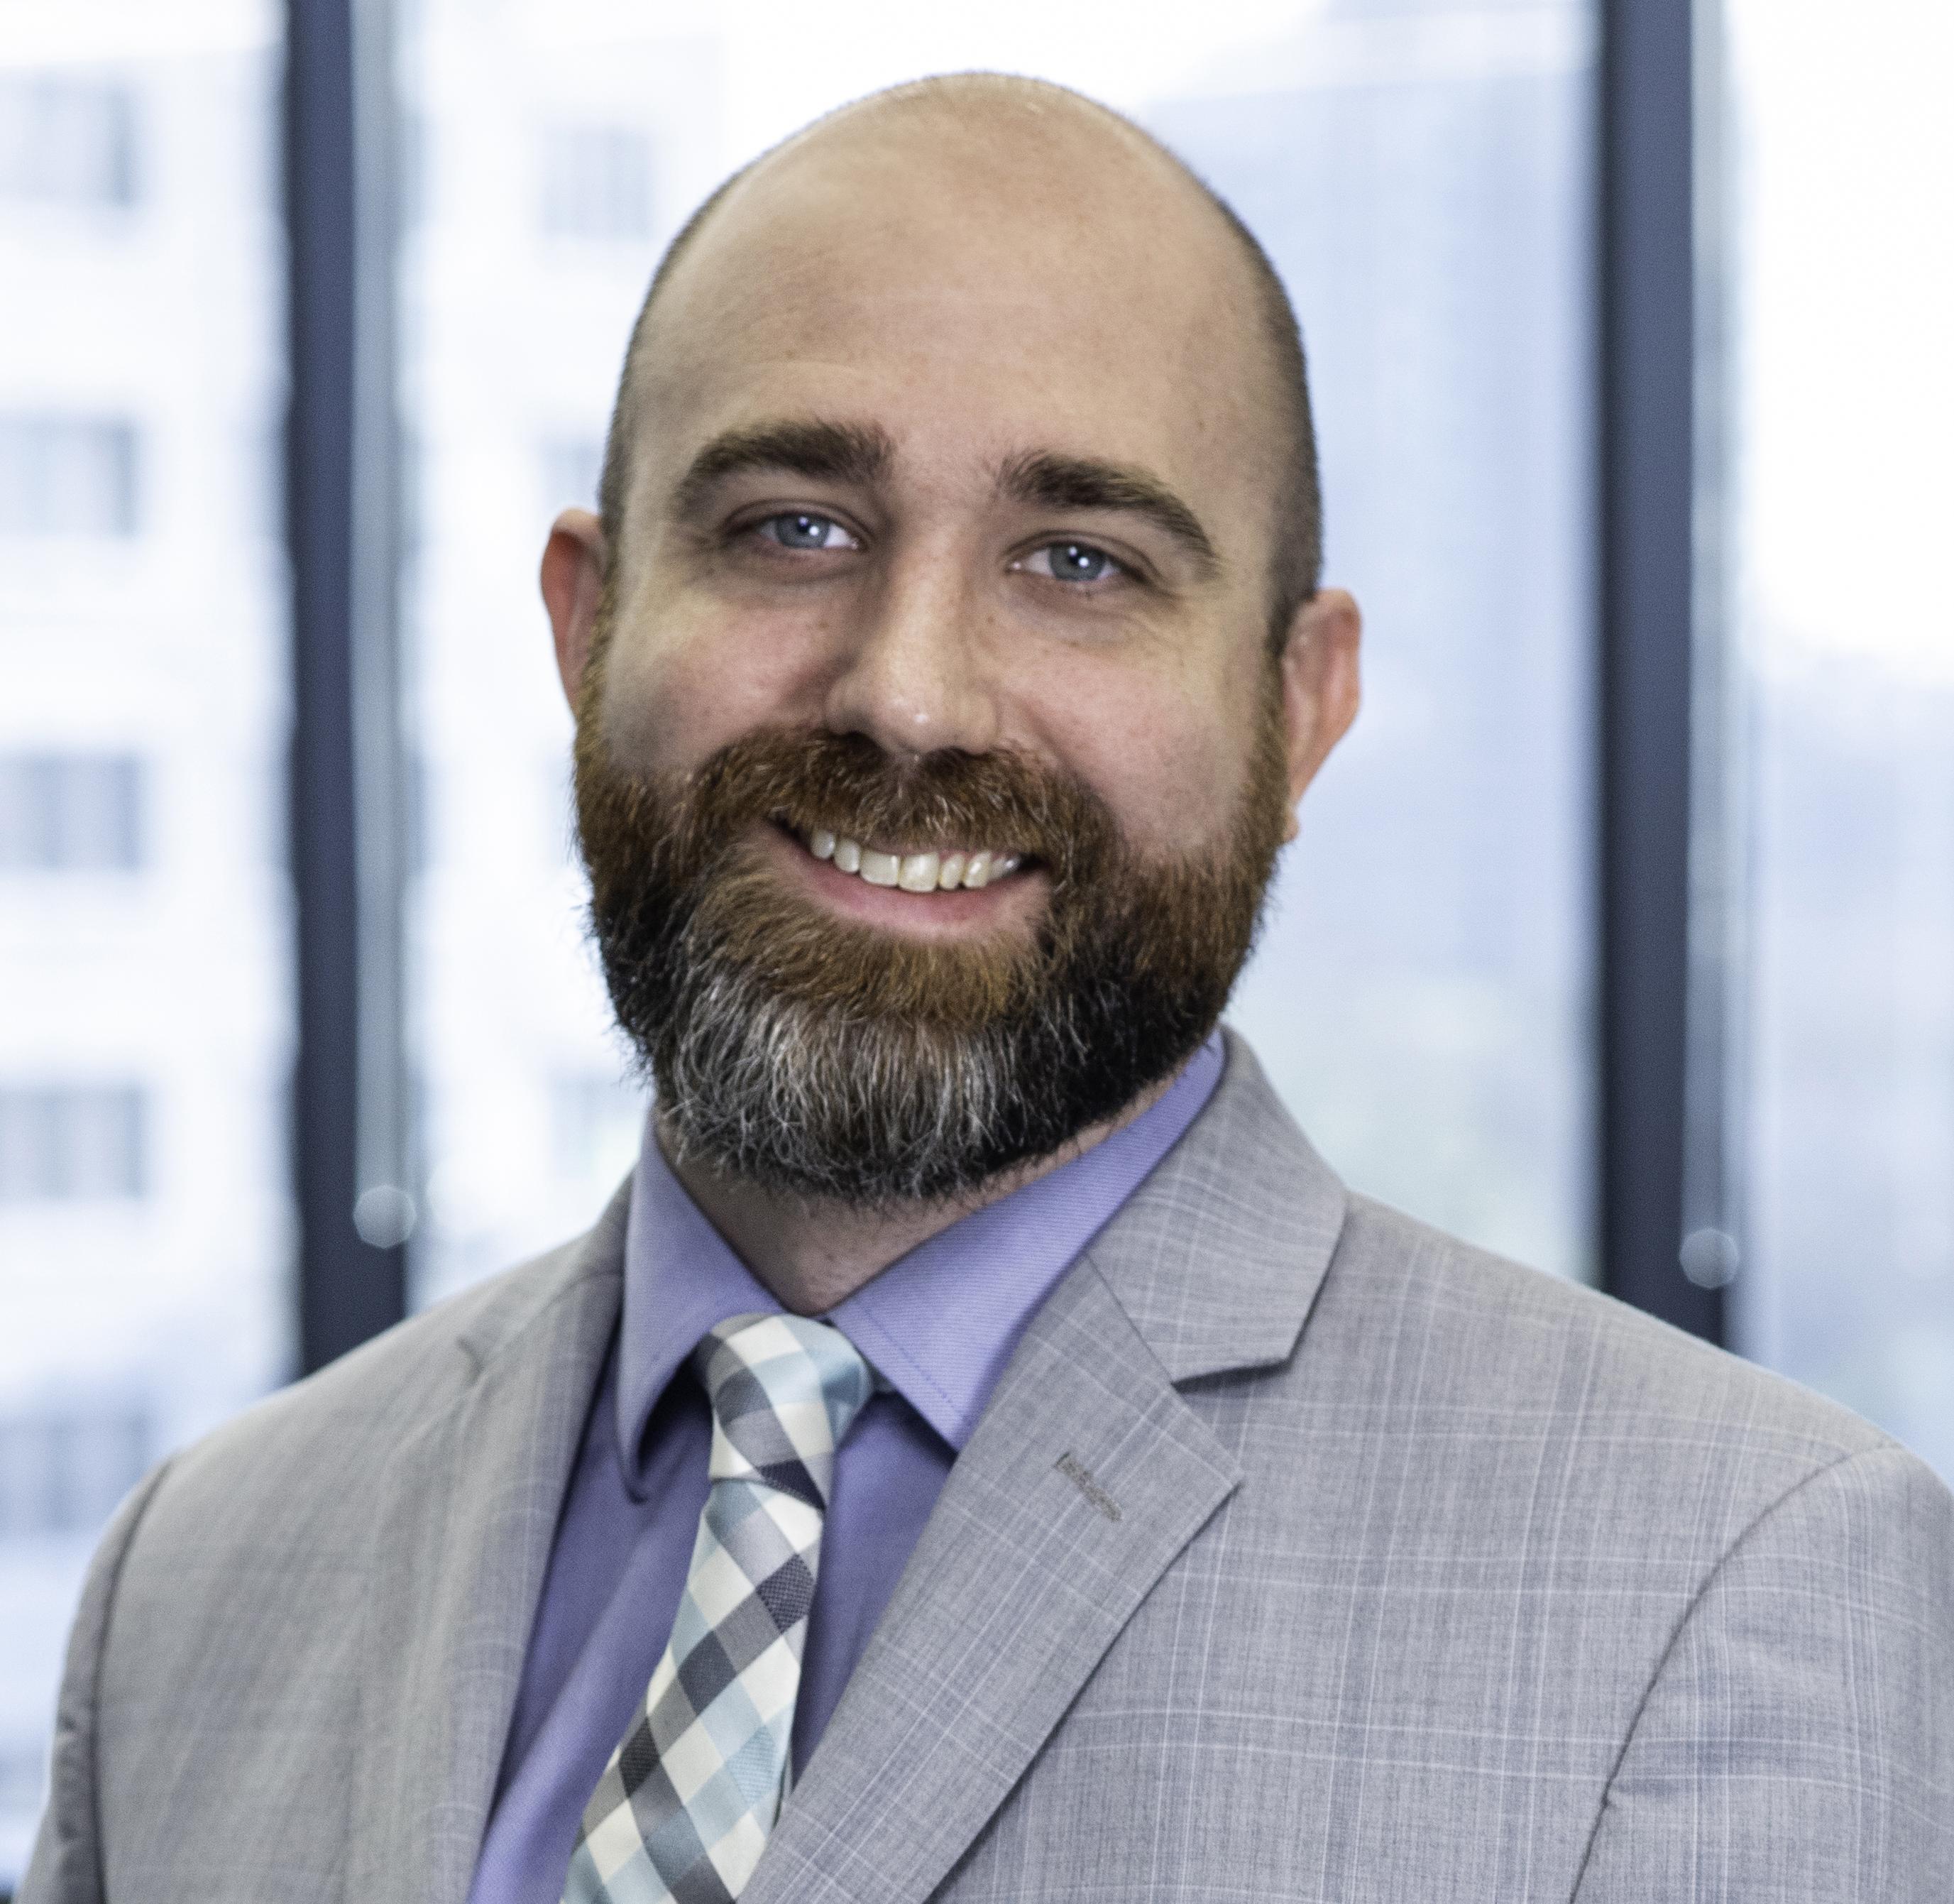 Landon Williams, Professional Services Supervisor